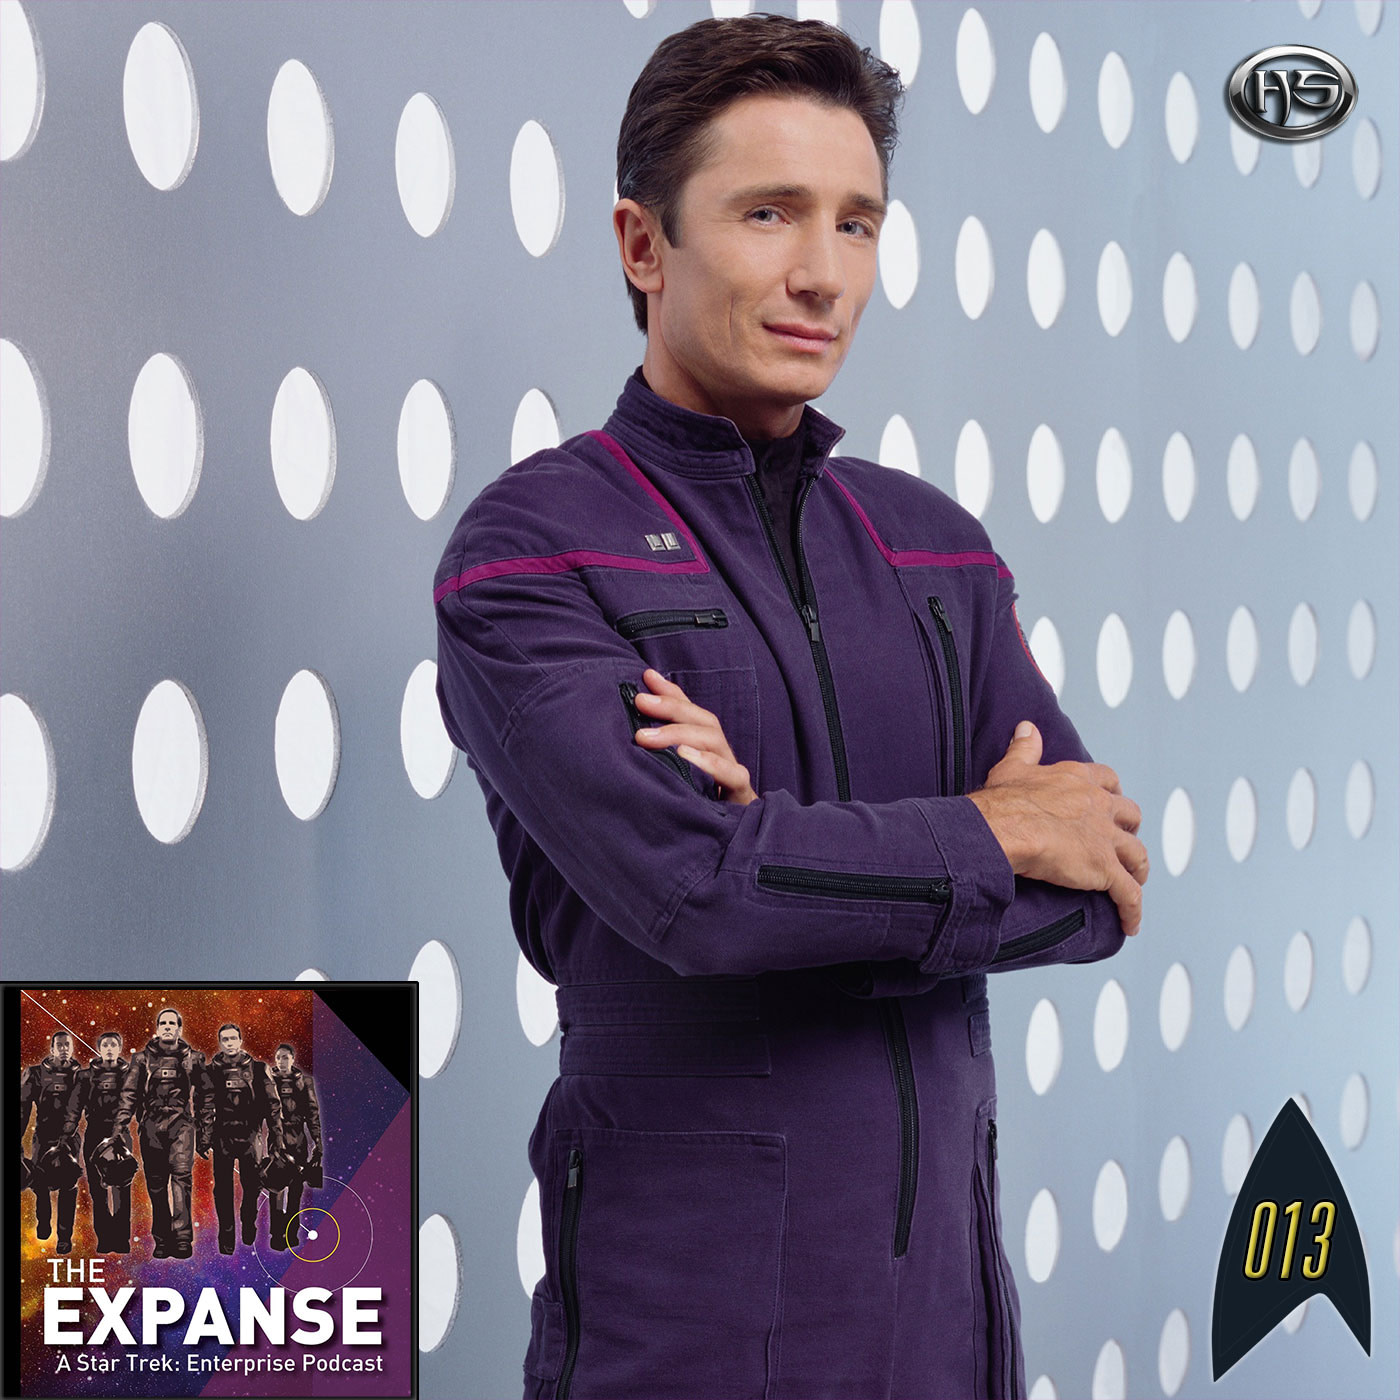 The Expanse Episode 13